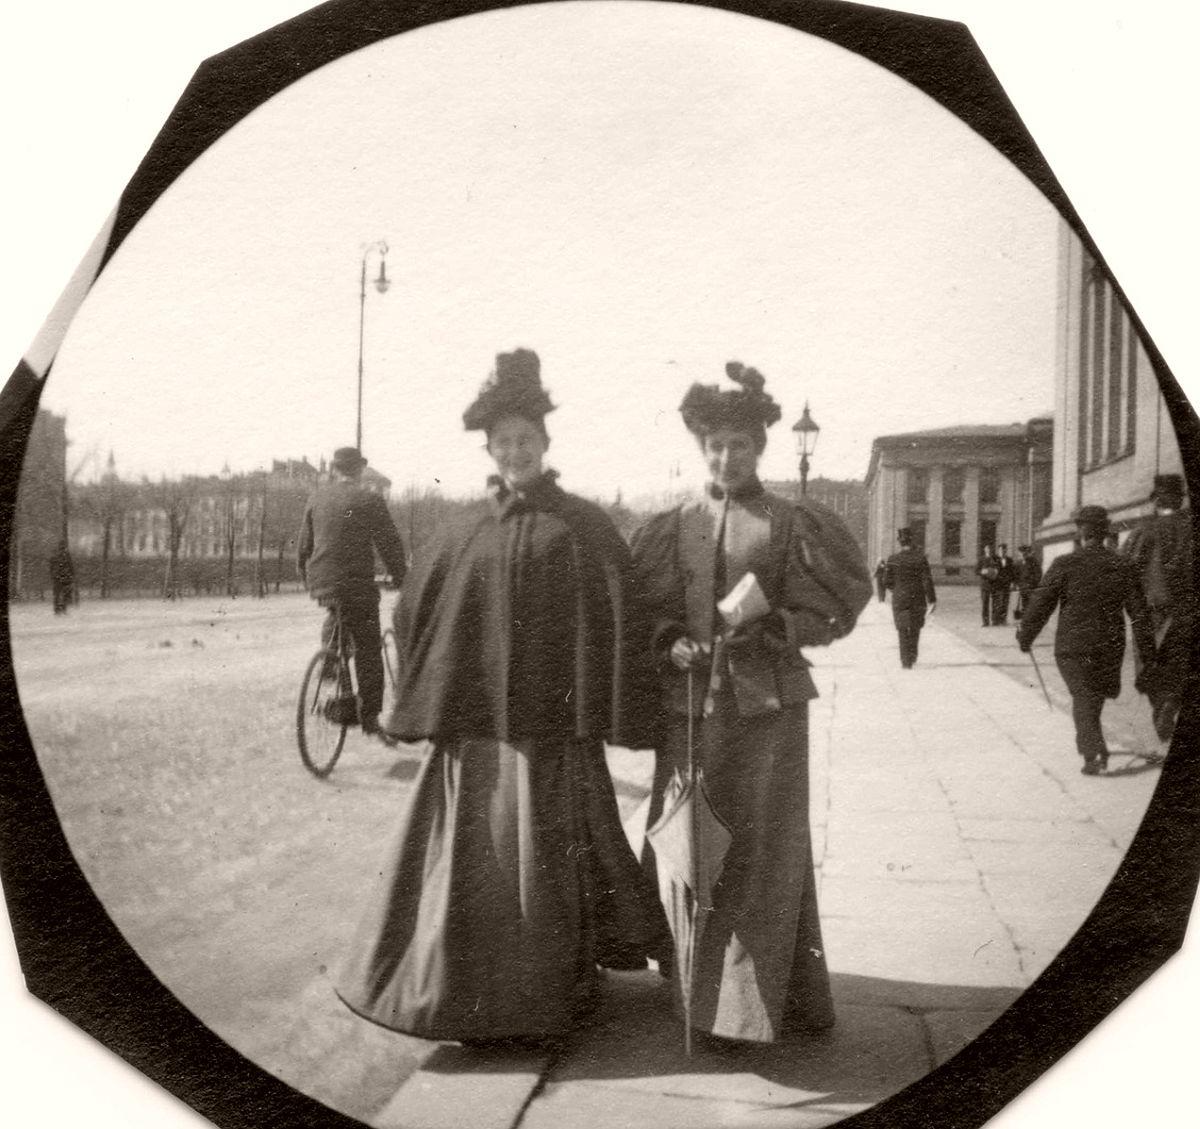 Vintage: Street Shots of Oslo by Carl Størmer (1890s)